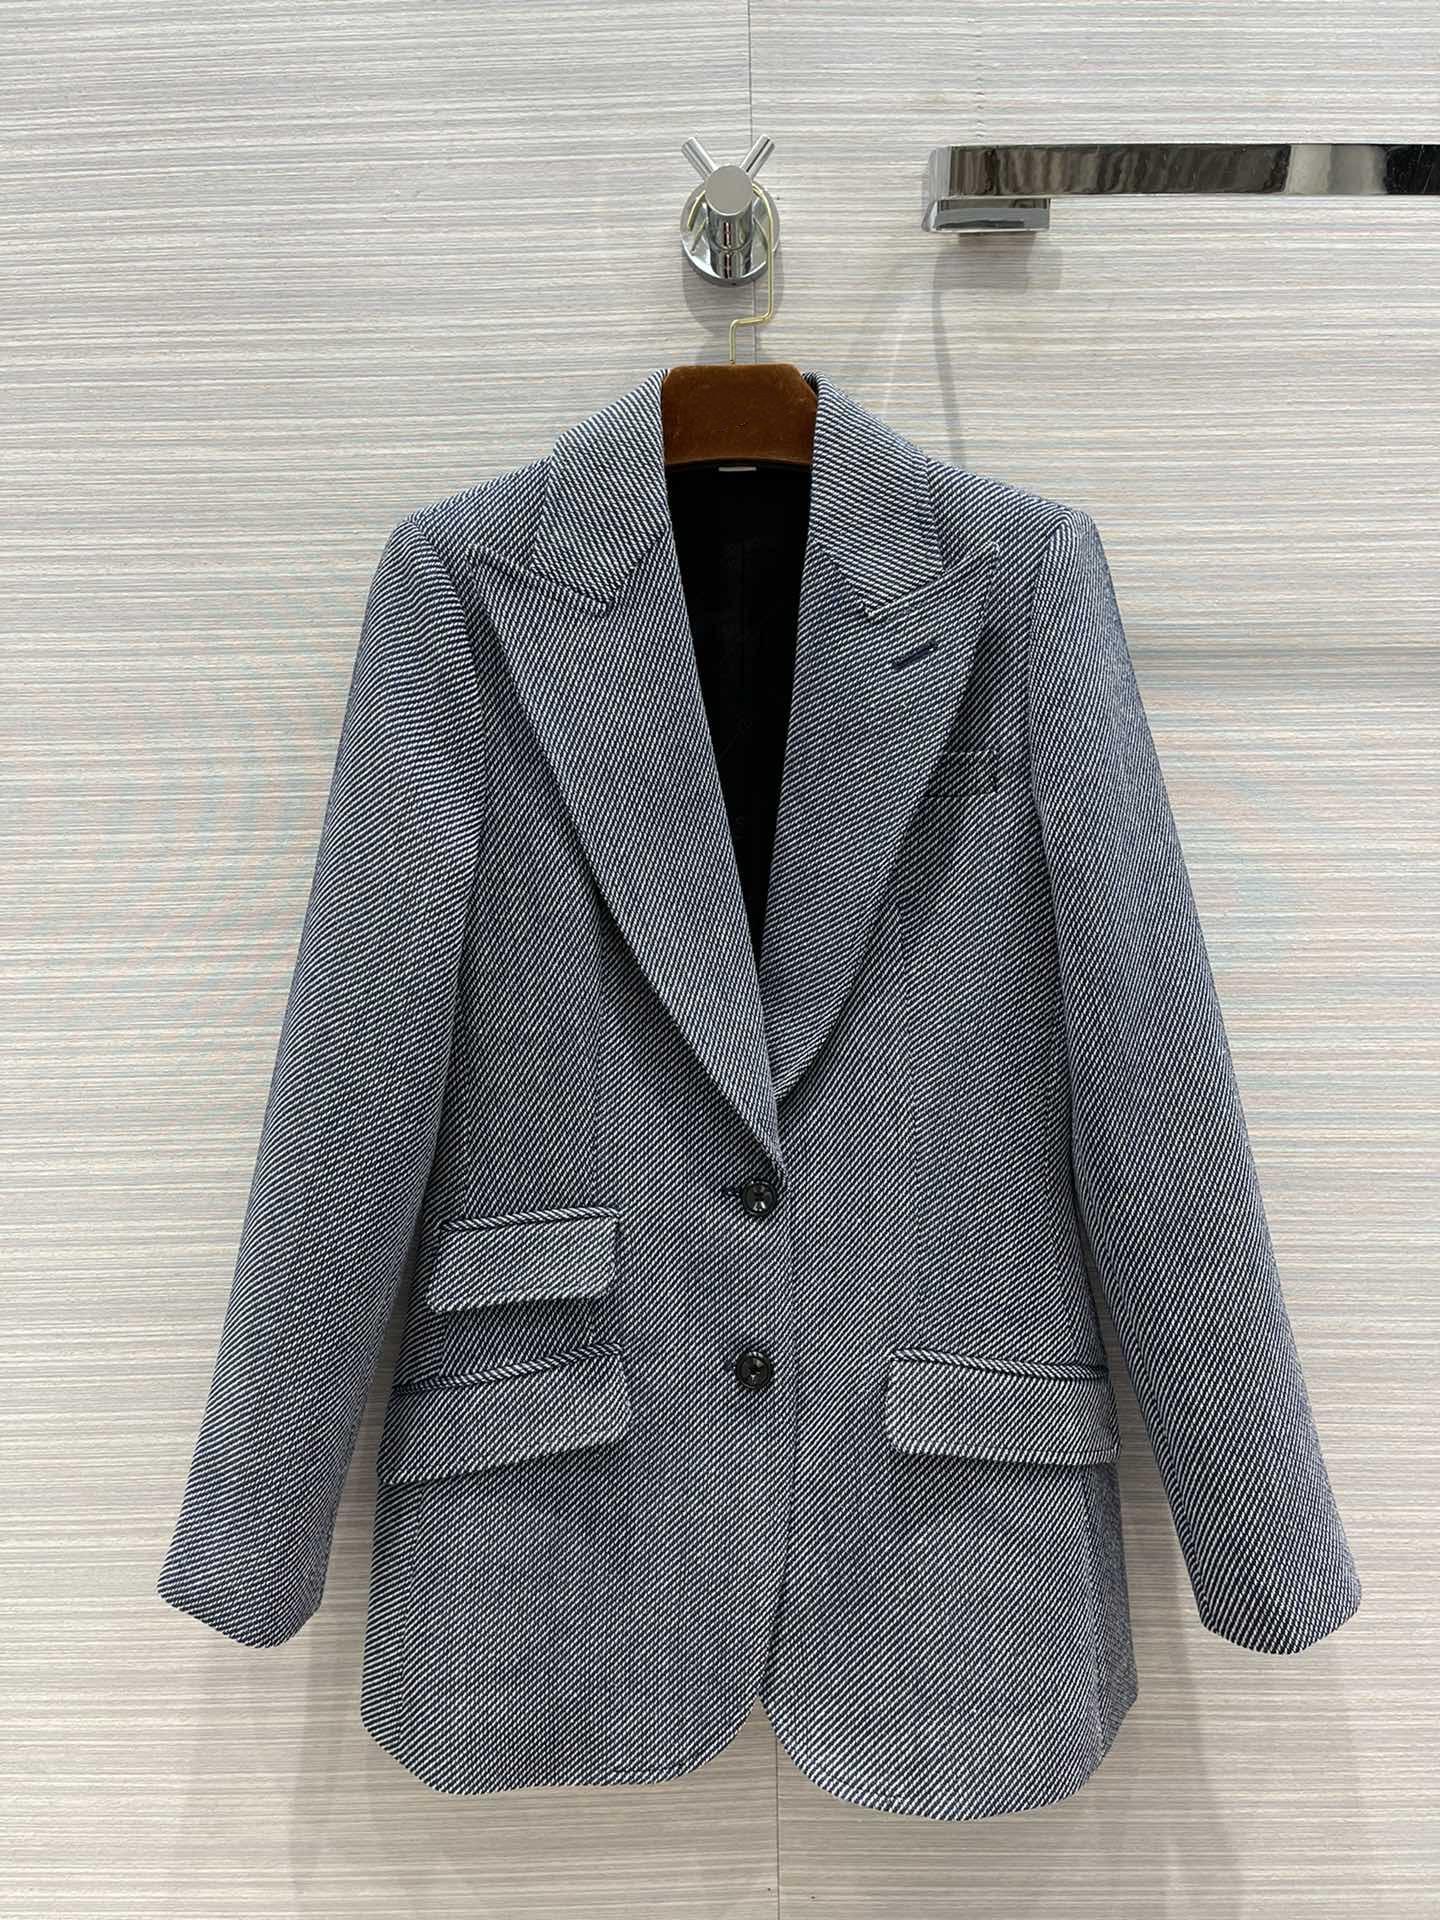 Milan Runway Coats 2021 Lapel Neck Long Sleeve Women's coats Designer Coats Brand Same Style Jackets 0520-10